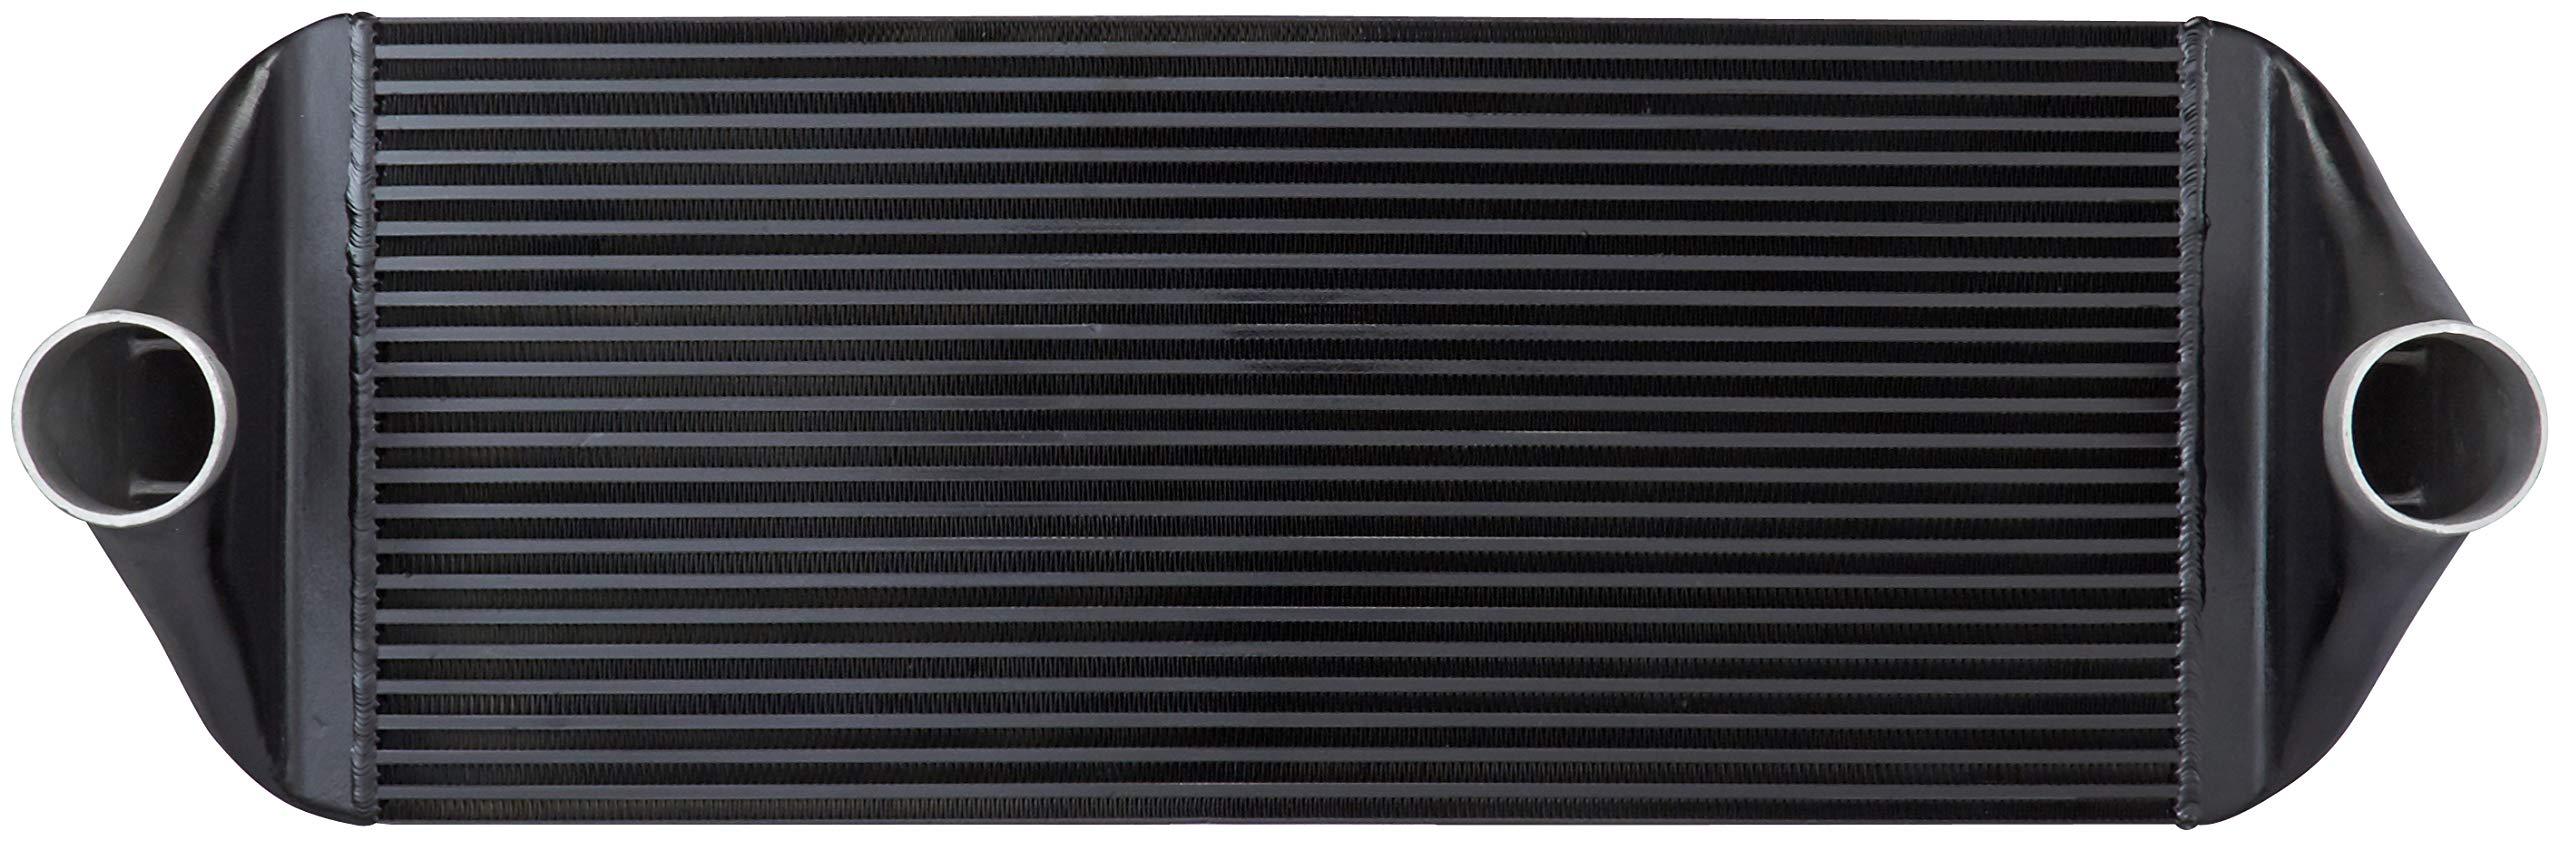 Spectra Premium 4401-3811 Turbocharger Intercooler